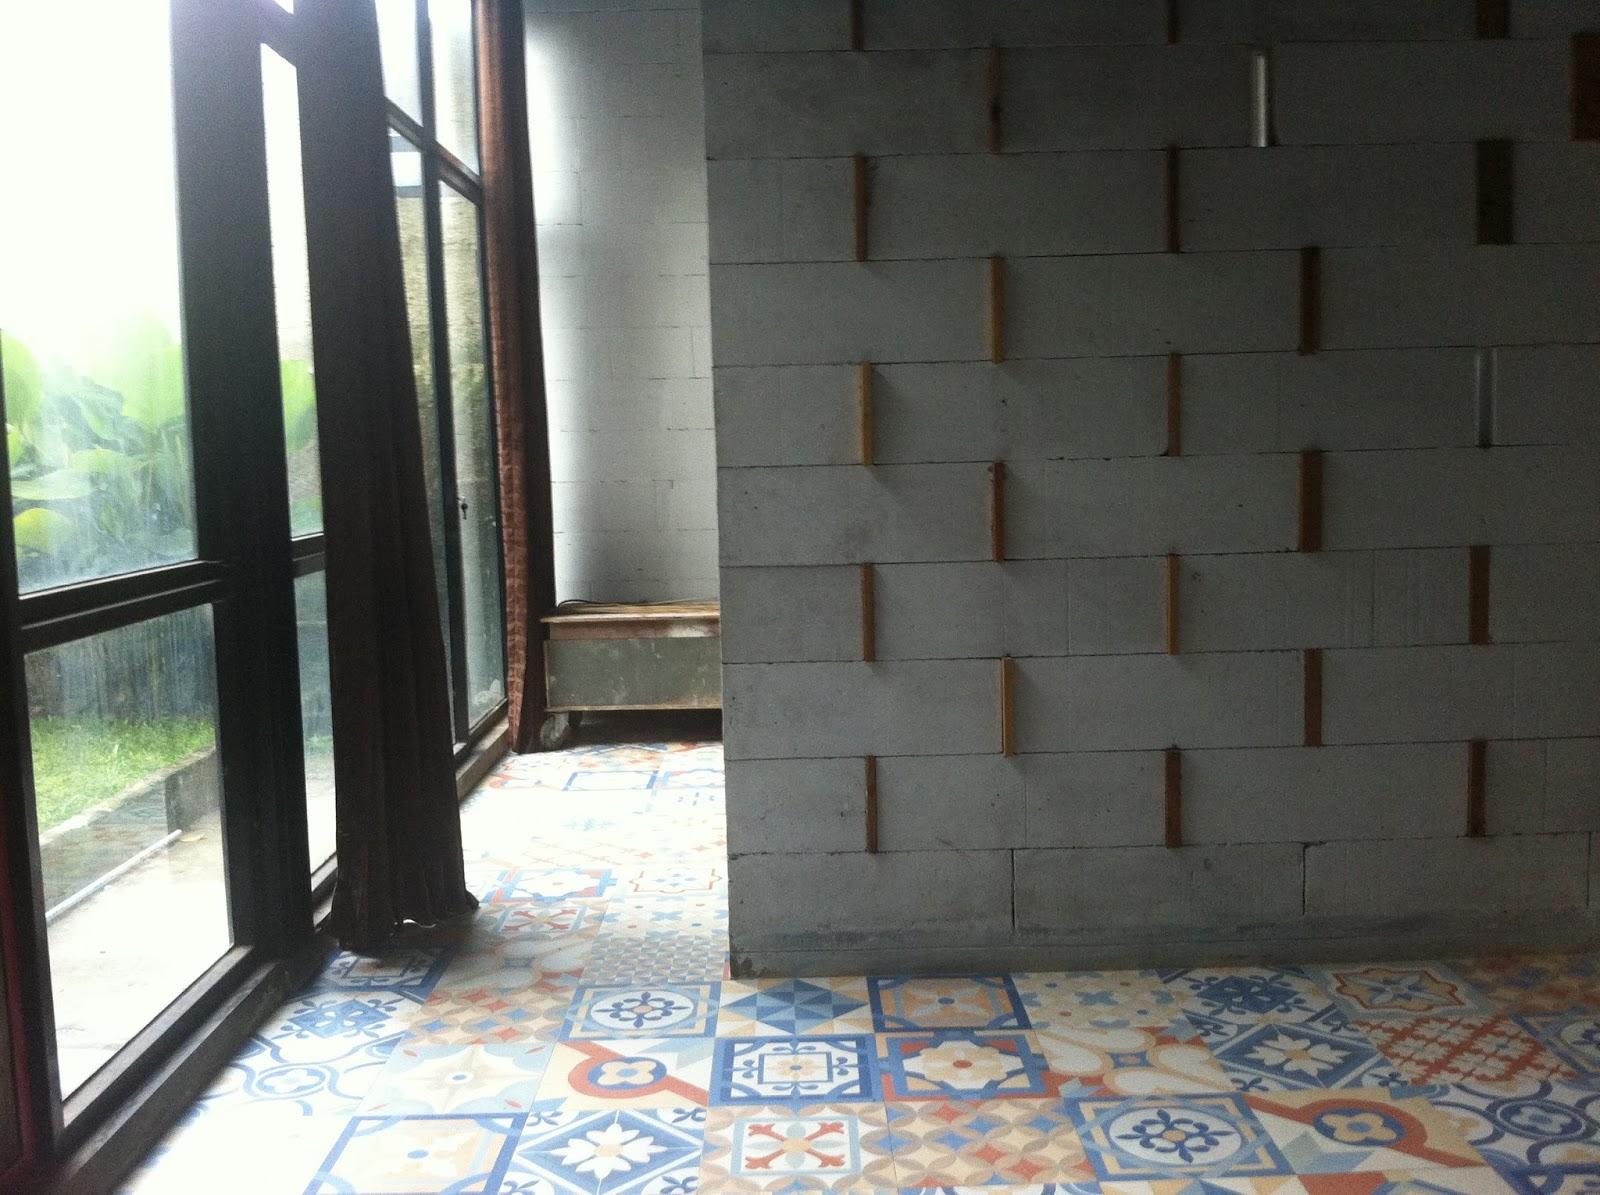 Terbaru 36+ Keramik Teras Warna Abu2